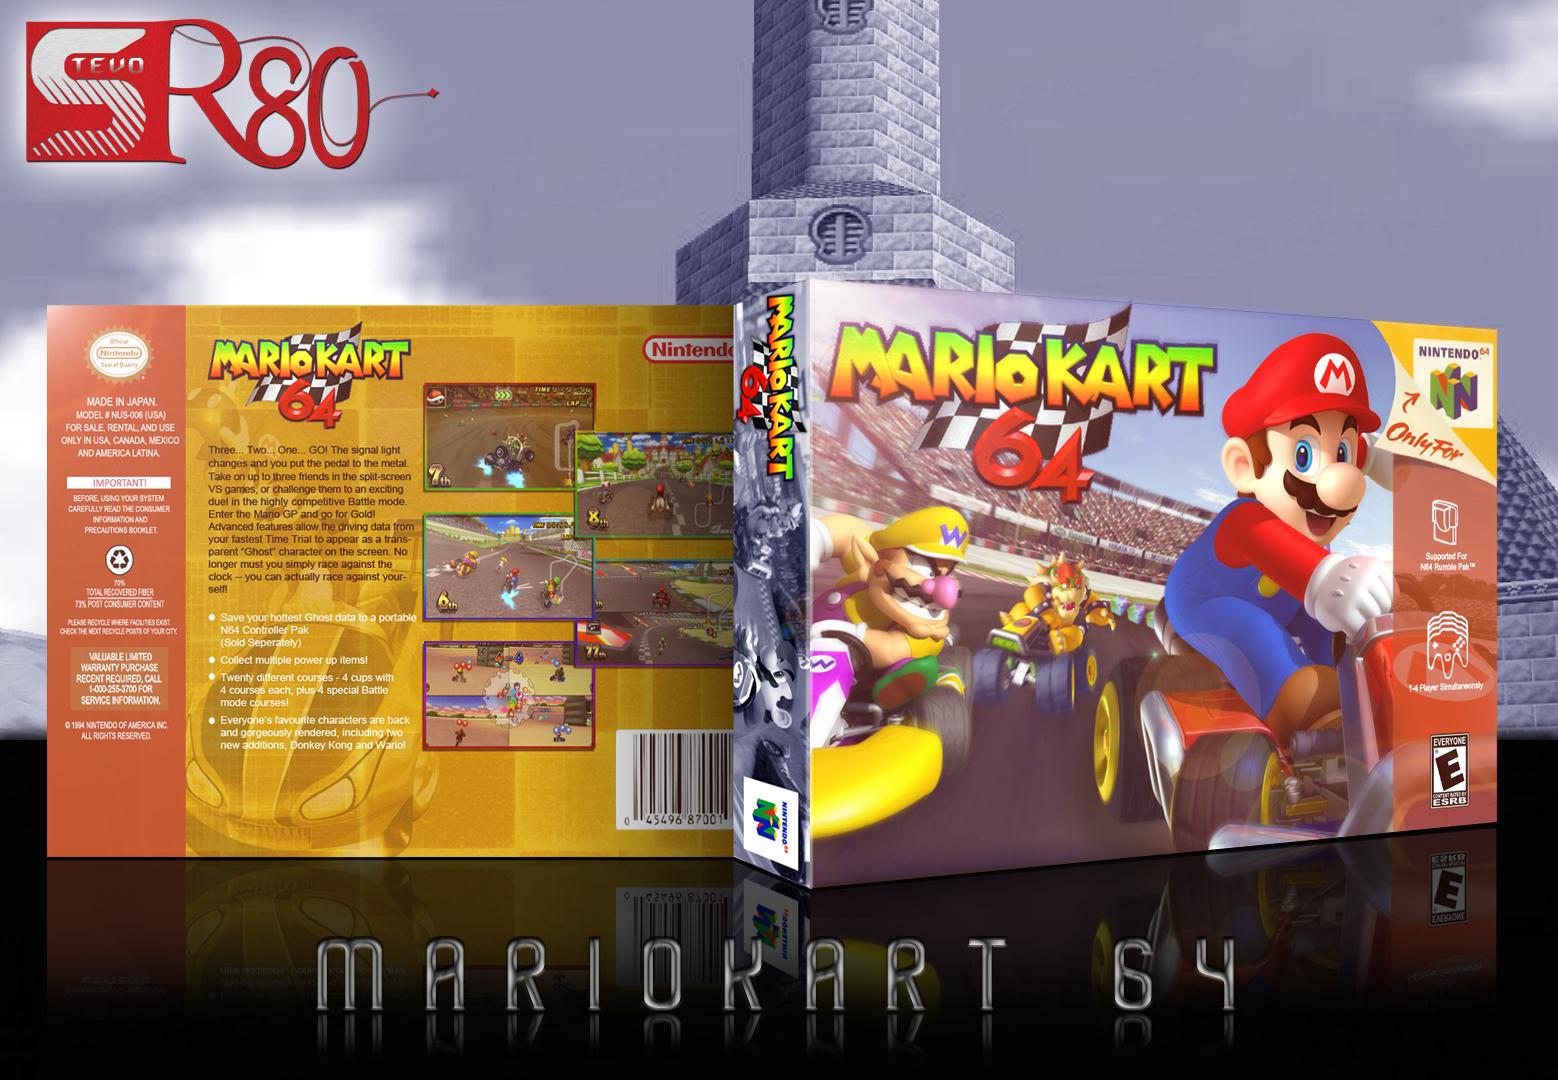 Mario Kart 64 Nintendo 64 Box Art Cover By Stevanr80